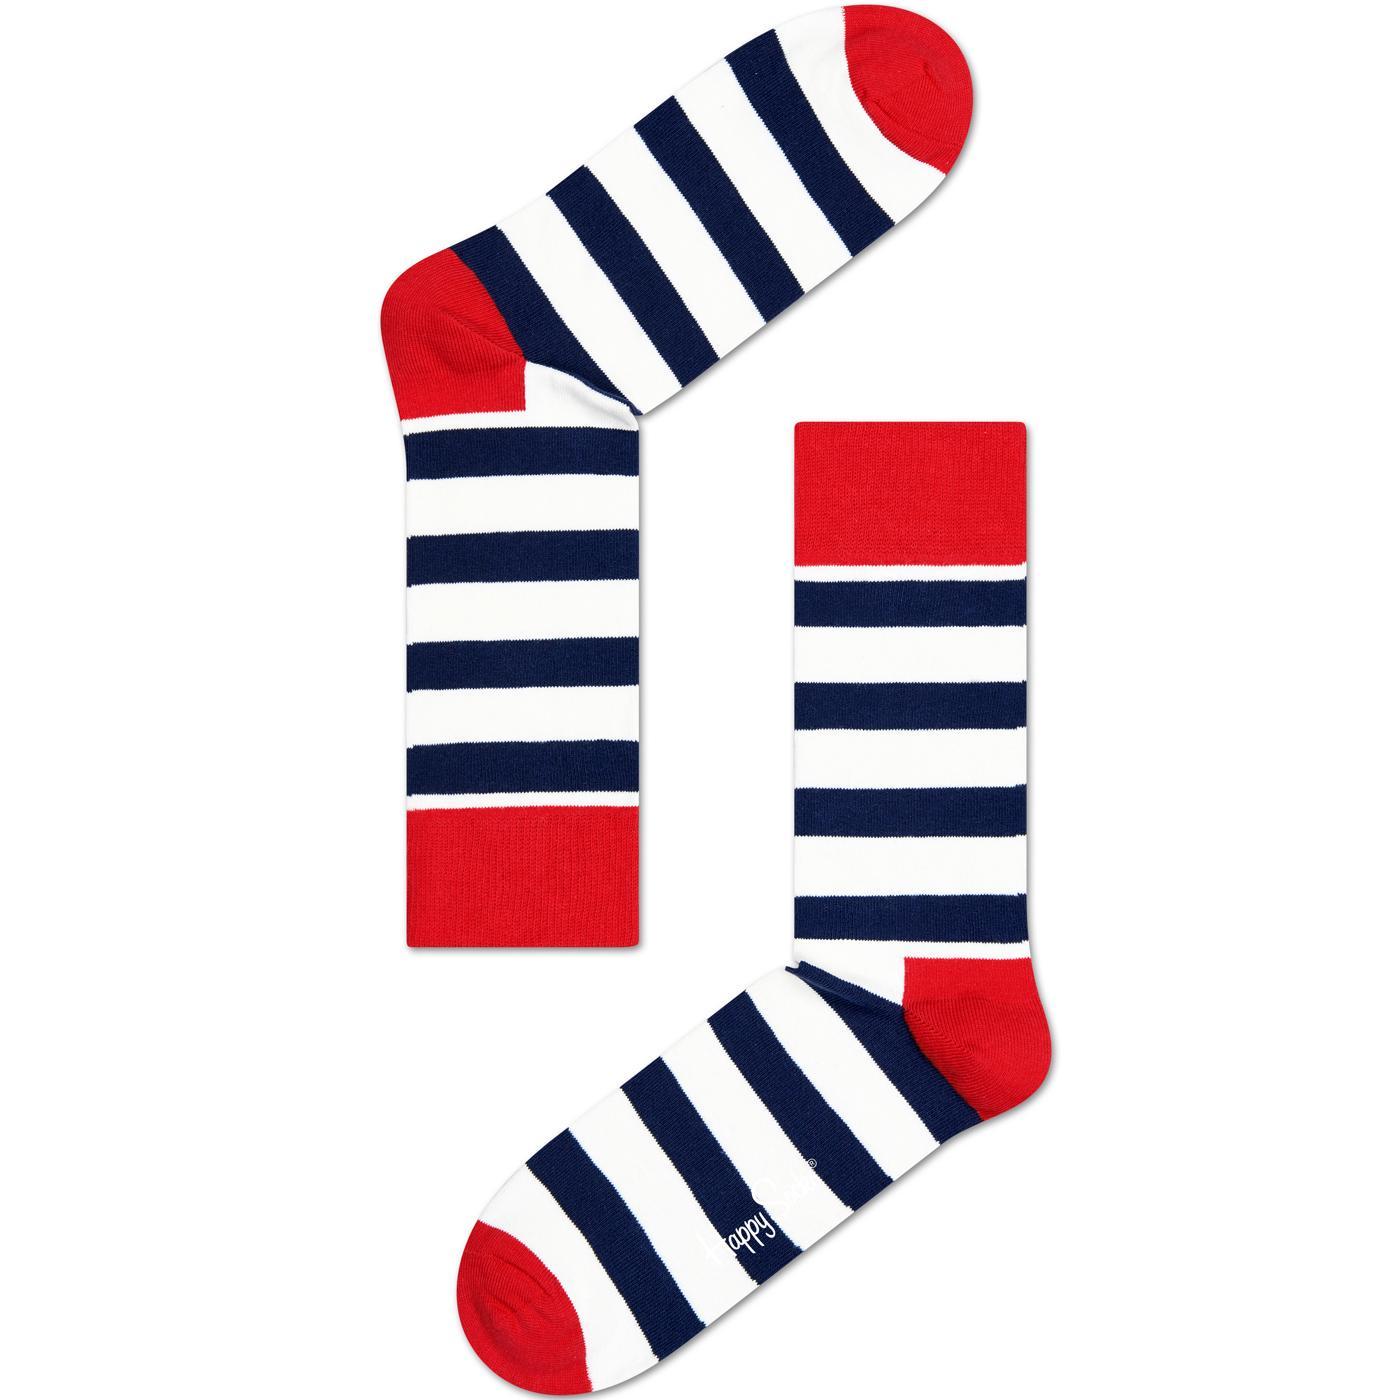 + HAPPY SOCKS Retro Breton Stripe Socks (OW/N/R)